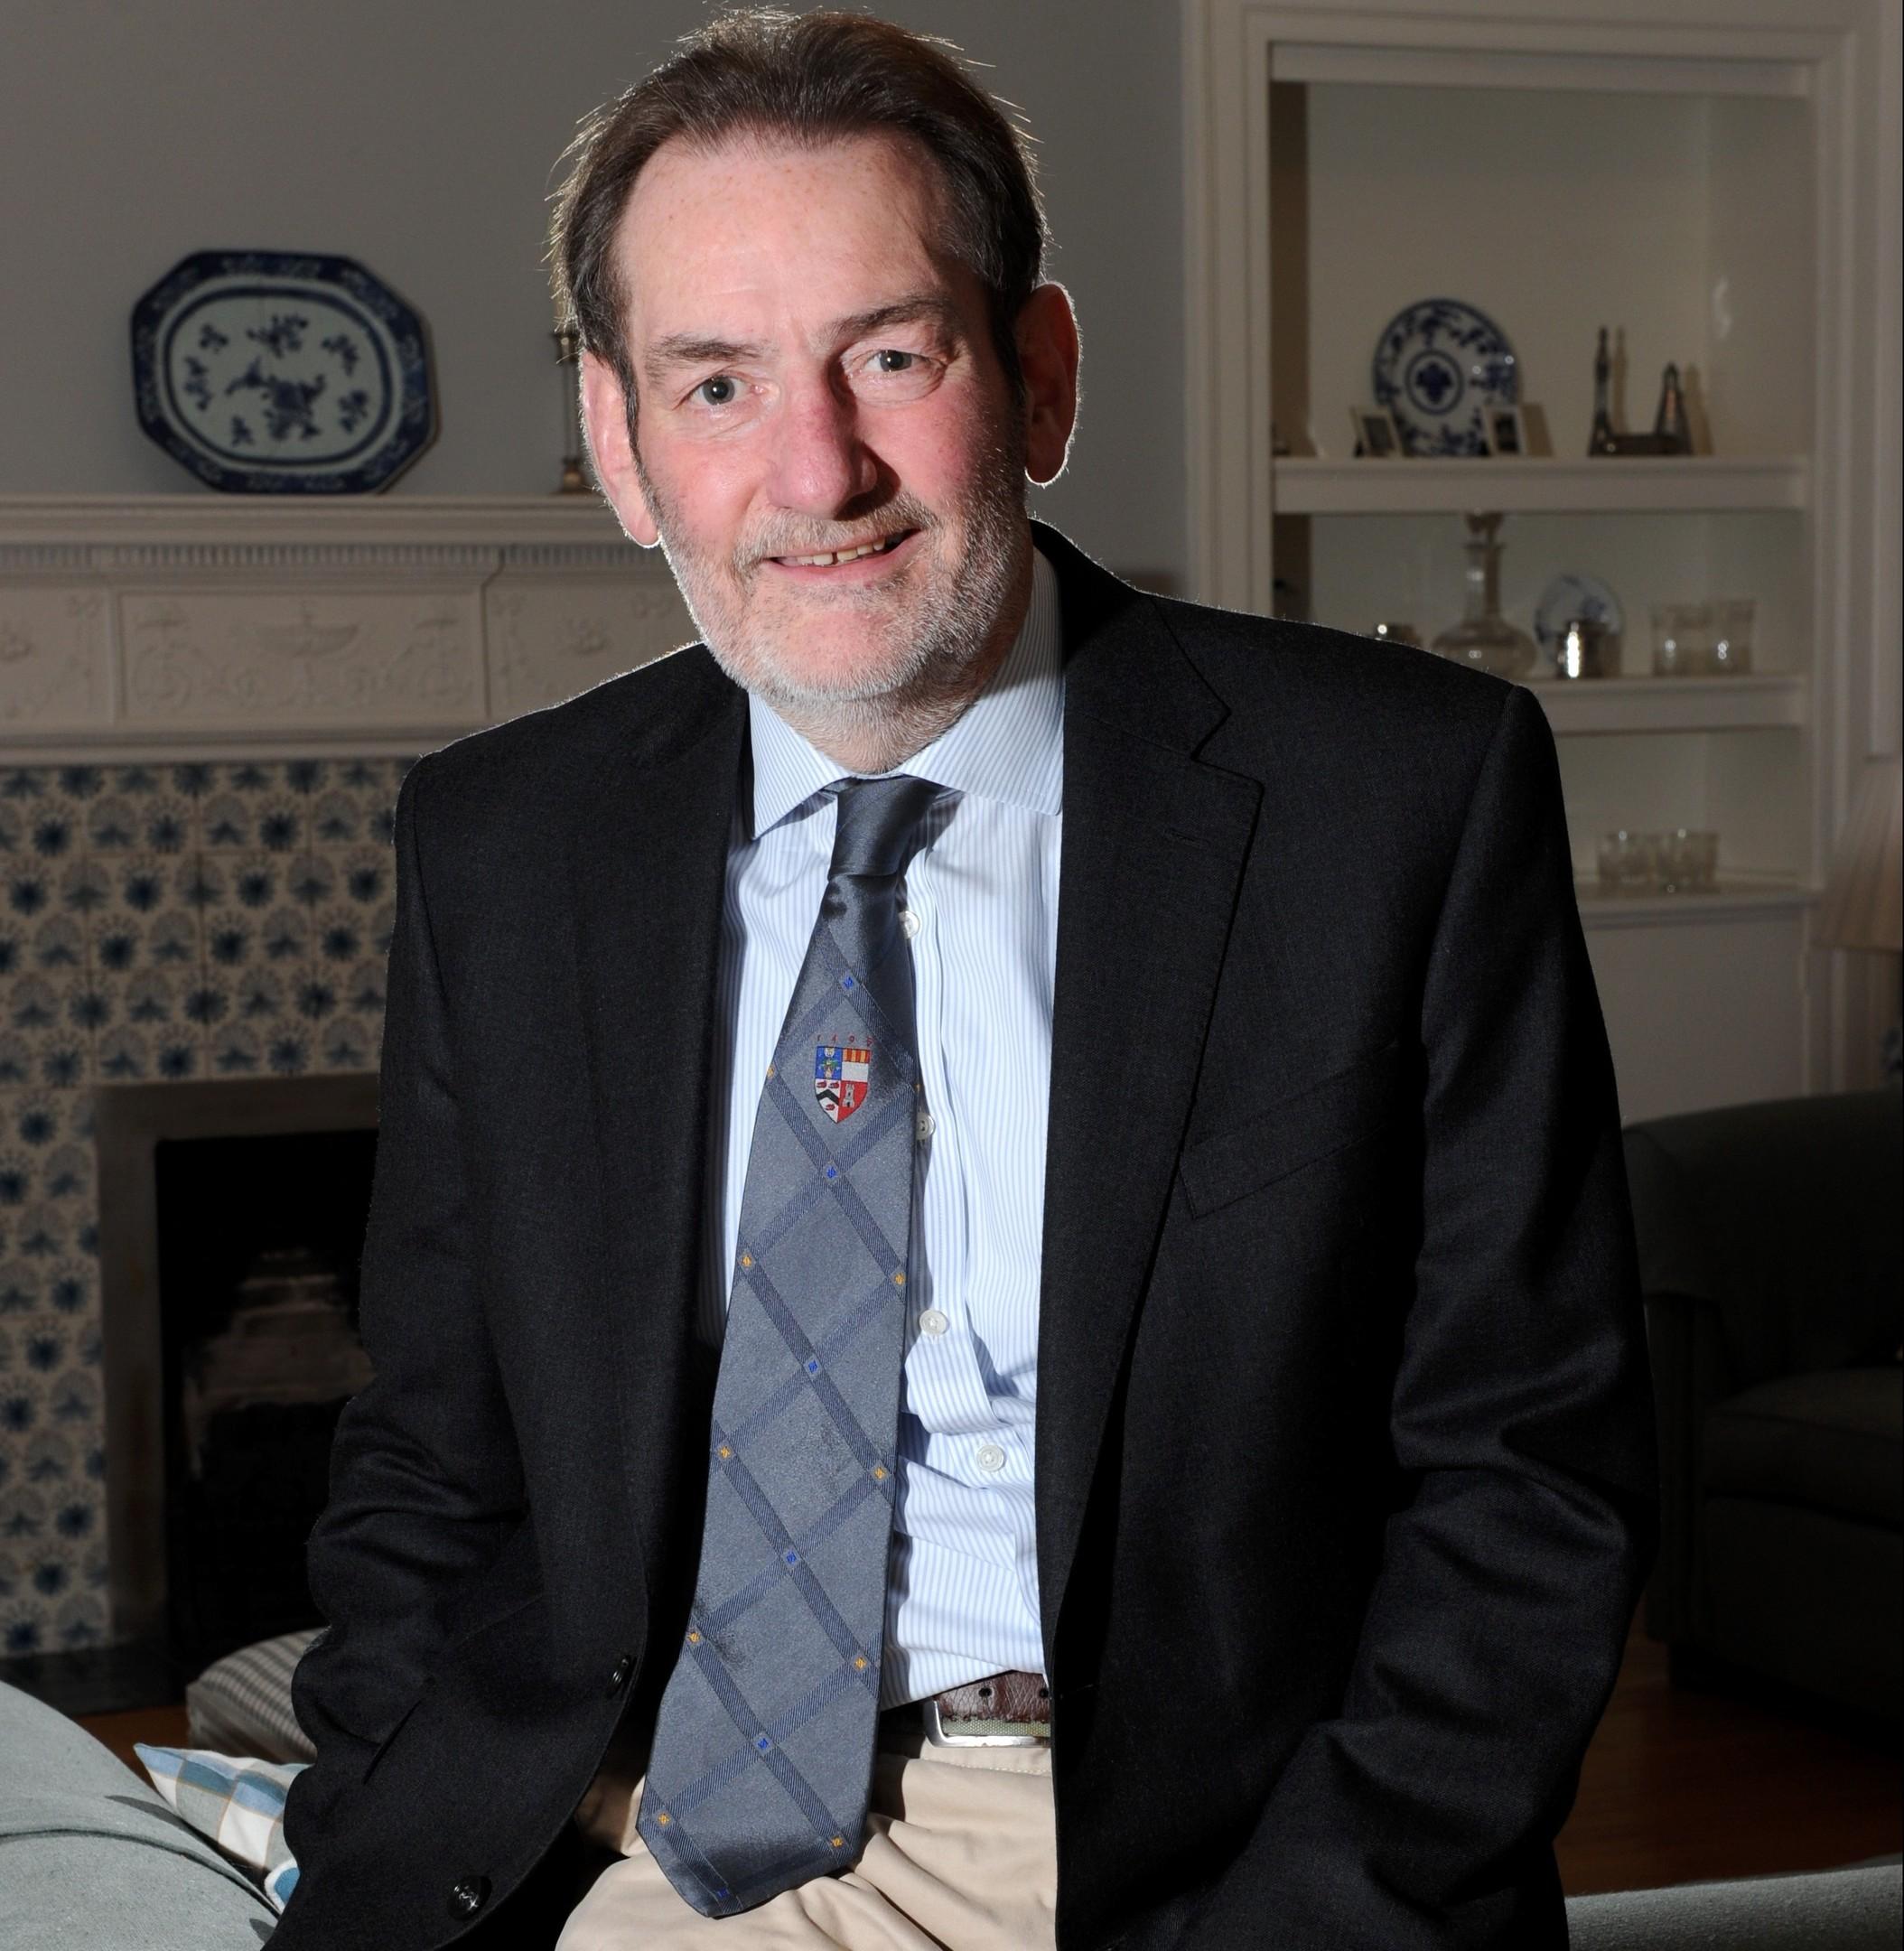 University of Aberdeen principal, Professor Sir Ian Diamond